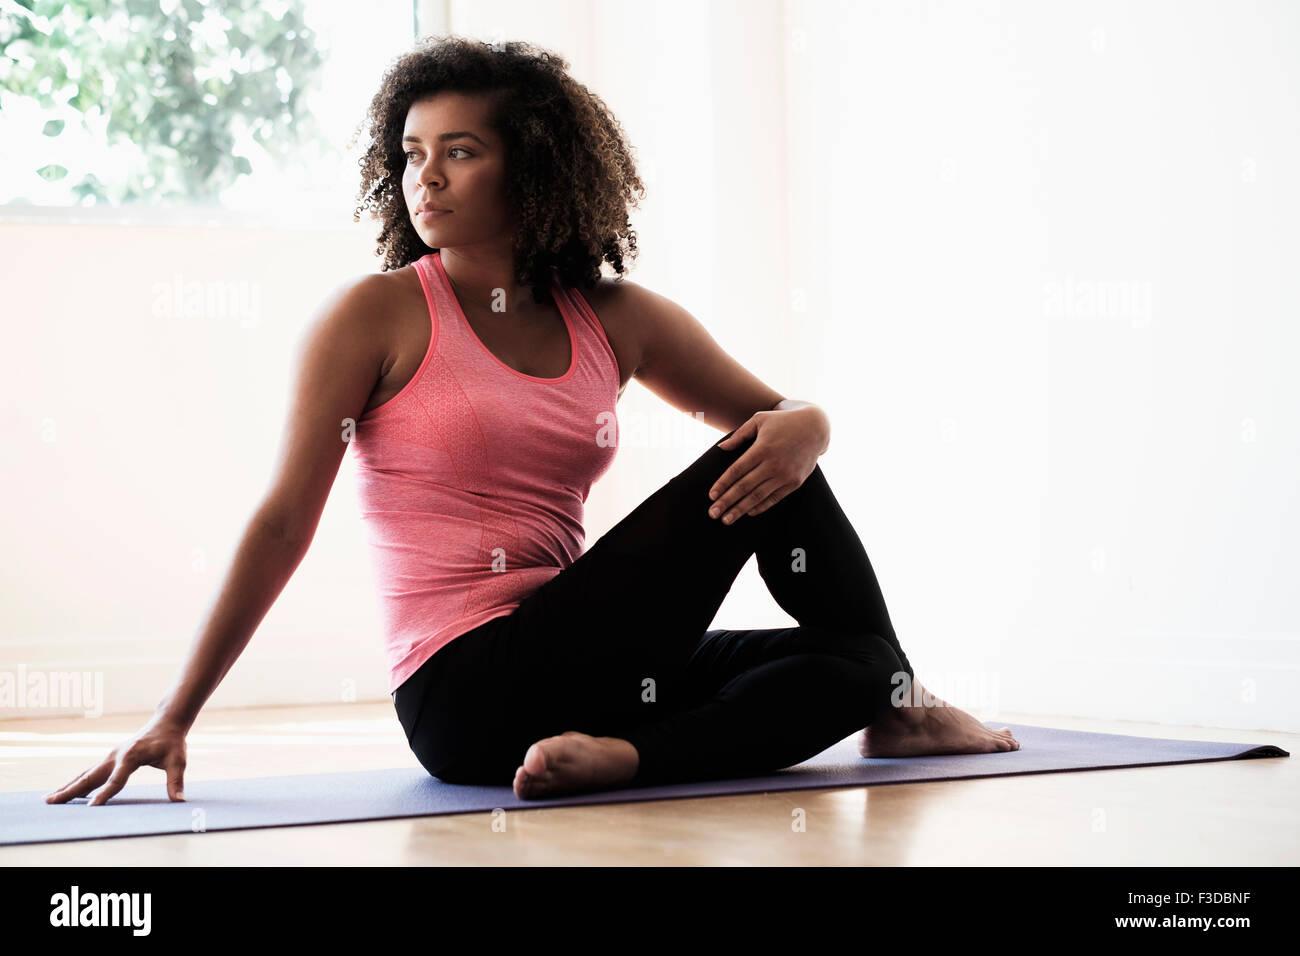 Porträt der jungen Frau im Fitnessstudio Stockbild